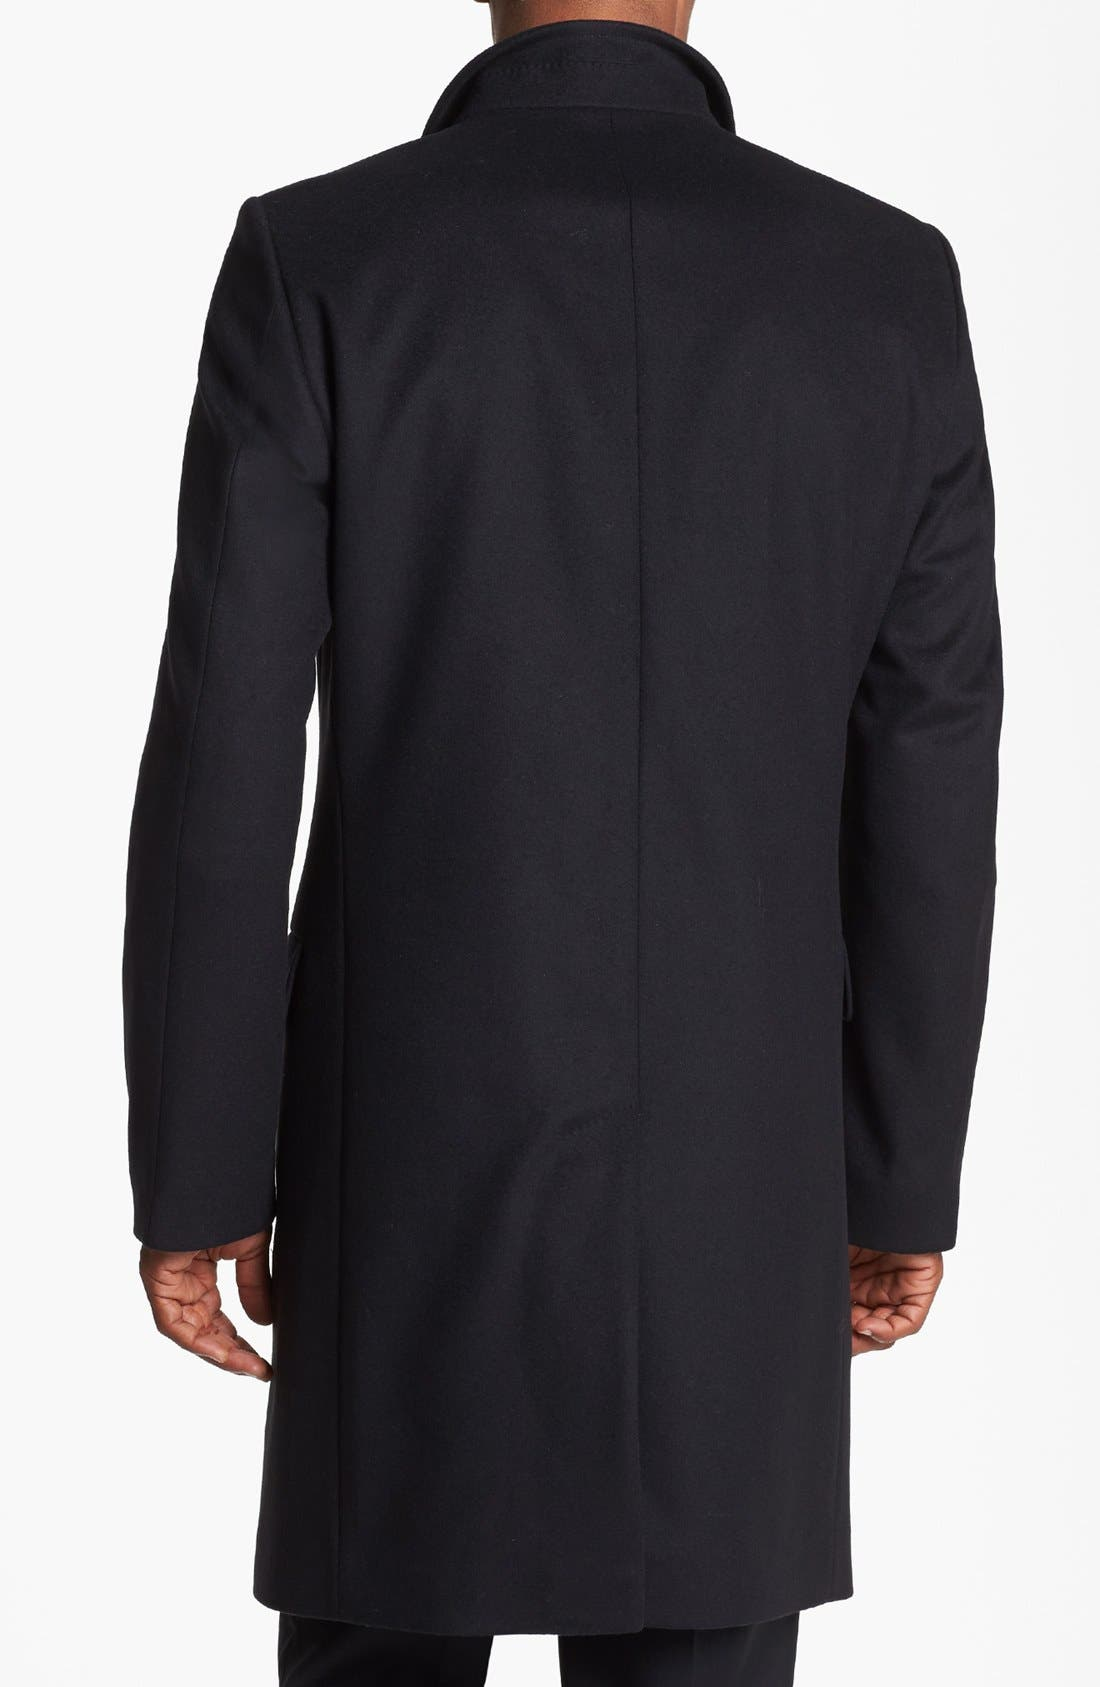 BOSS HUGO BOSS 'Sintrax' Wool Blend Coat,                             Alternate thumbnail 4, color,                             001